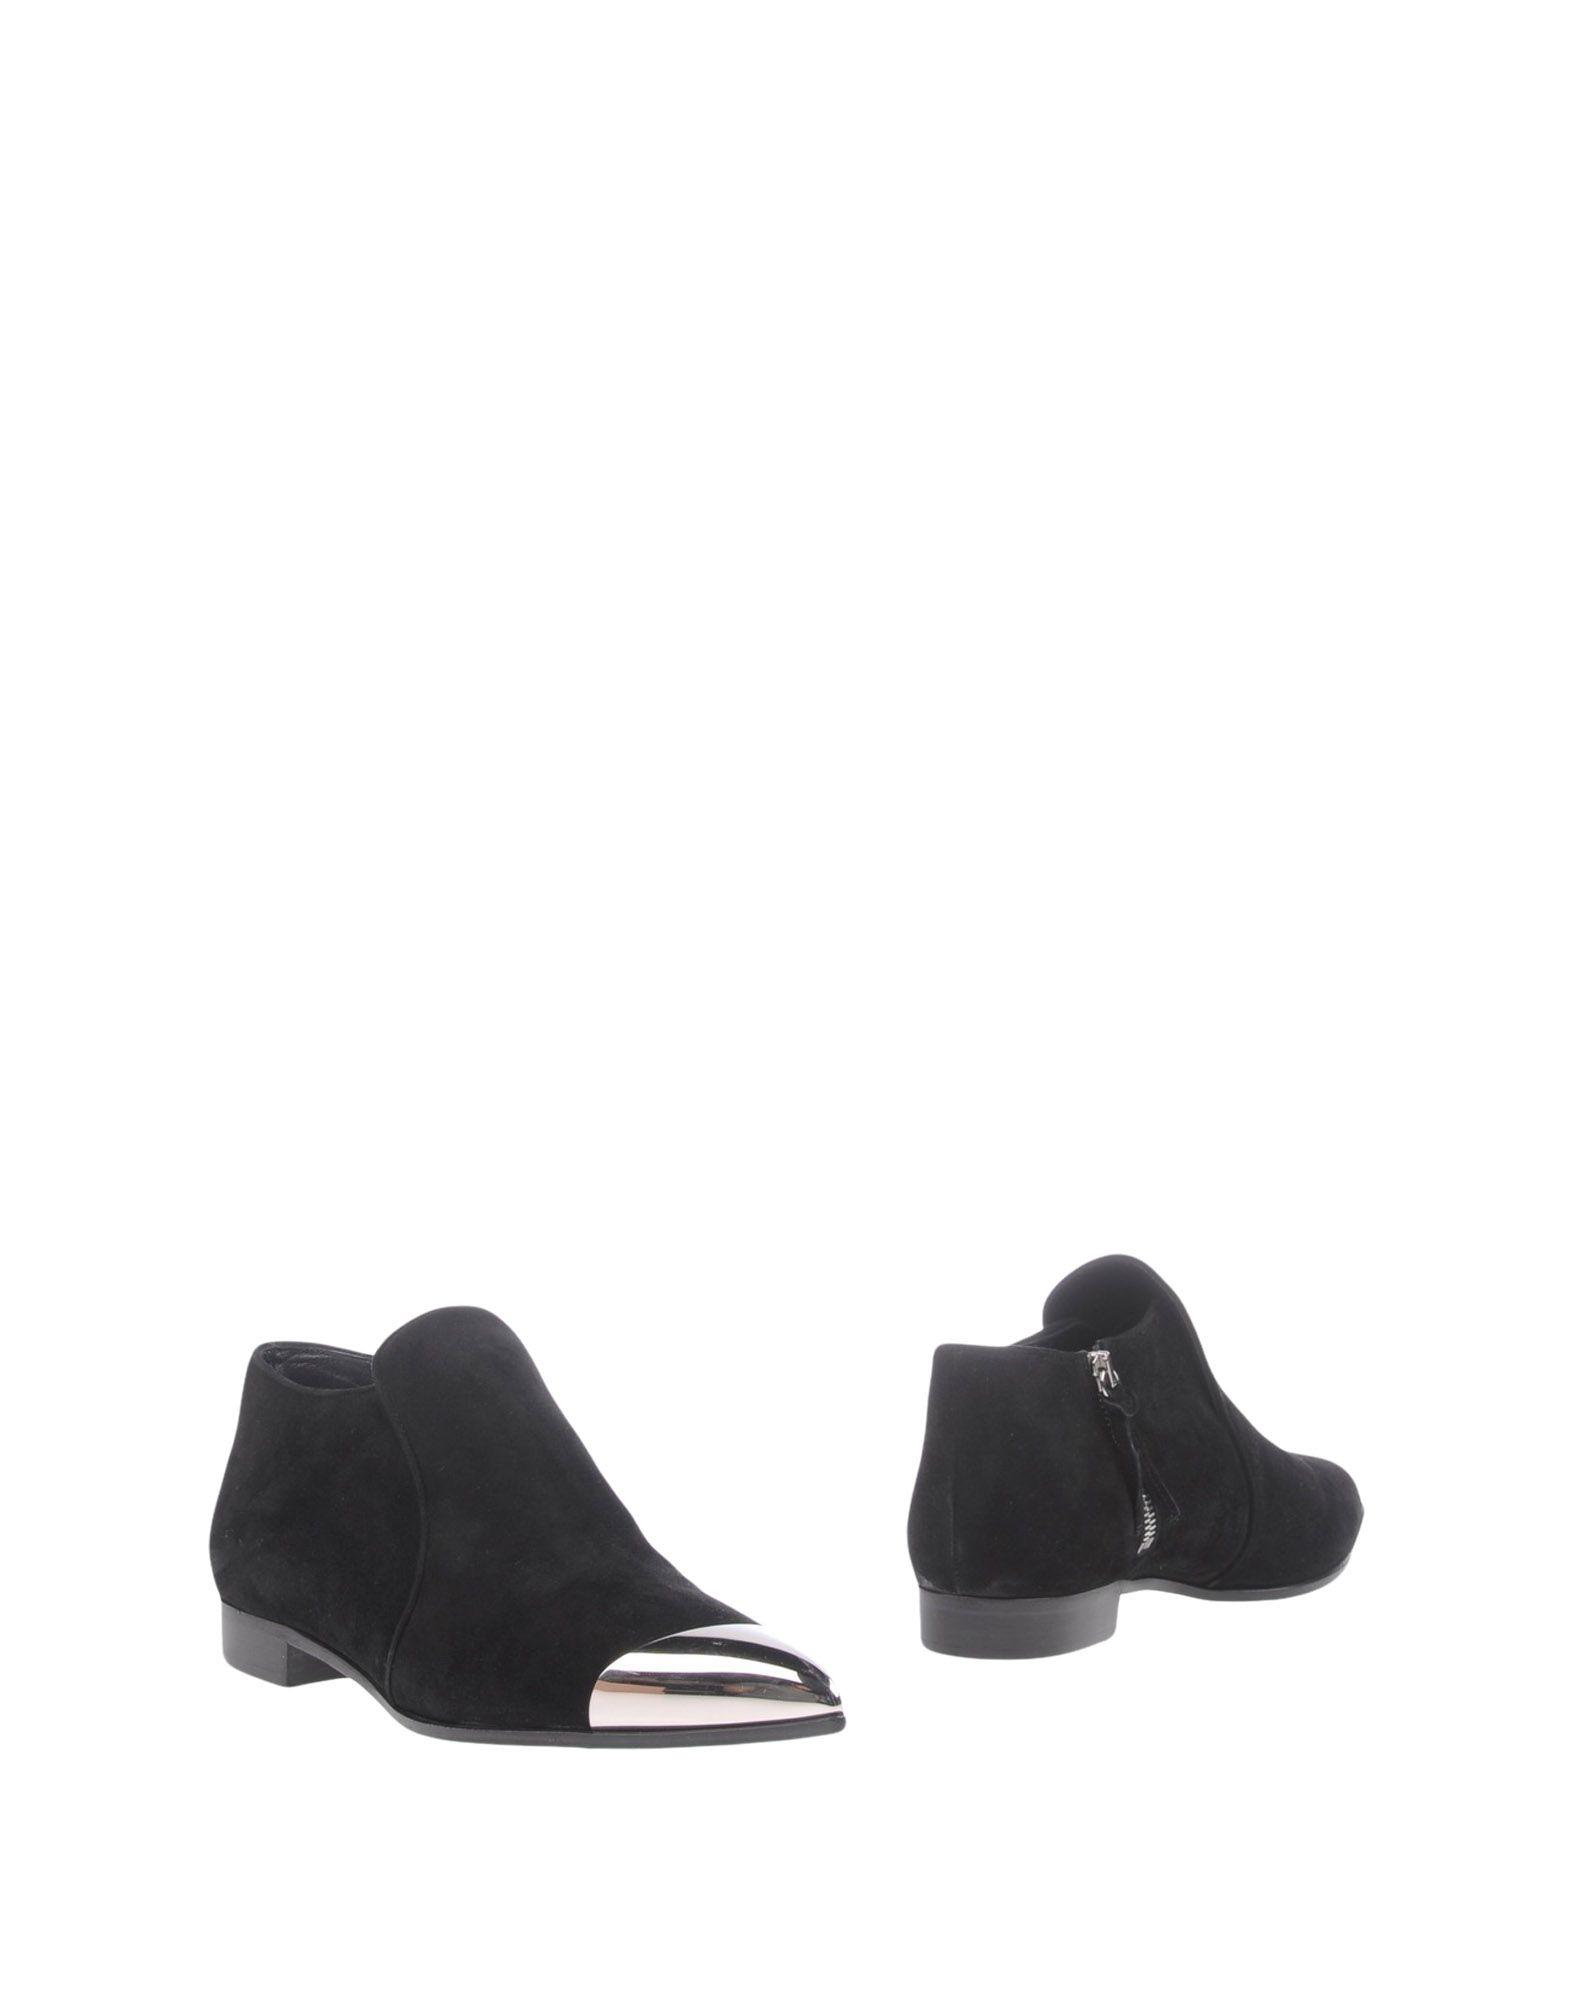 Miu Miu Stiefelette Damen  Schuhe 11211351FTGünstige gut aussehende Schuhe  588114